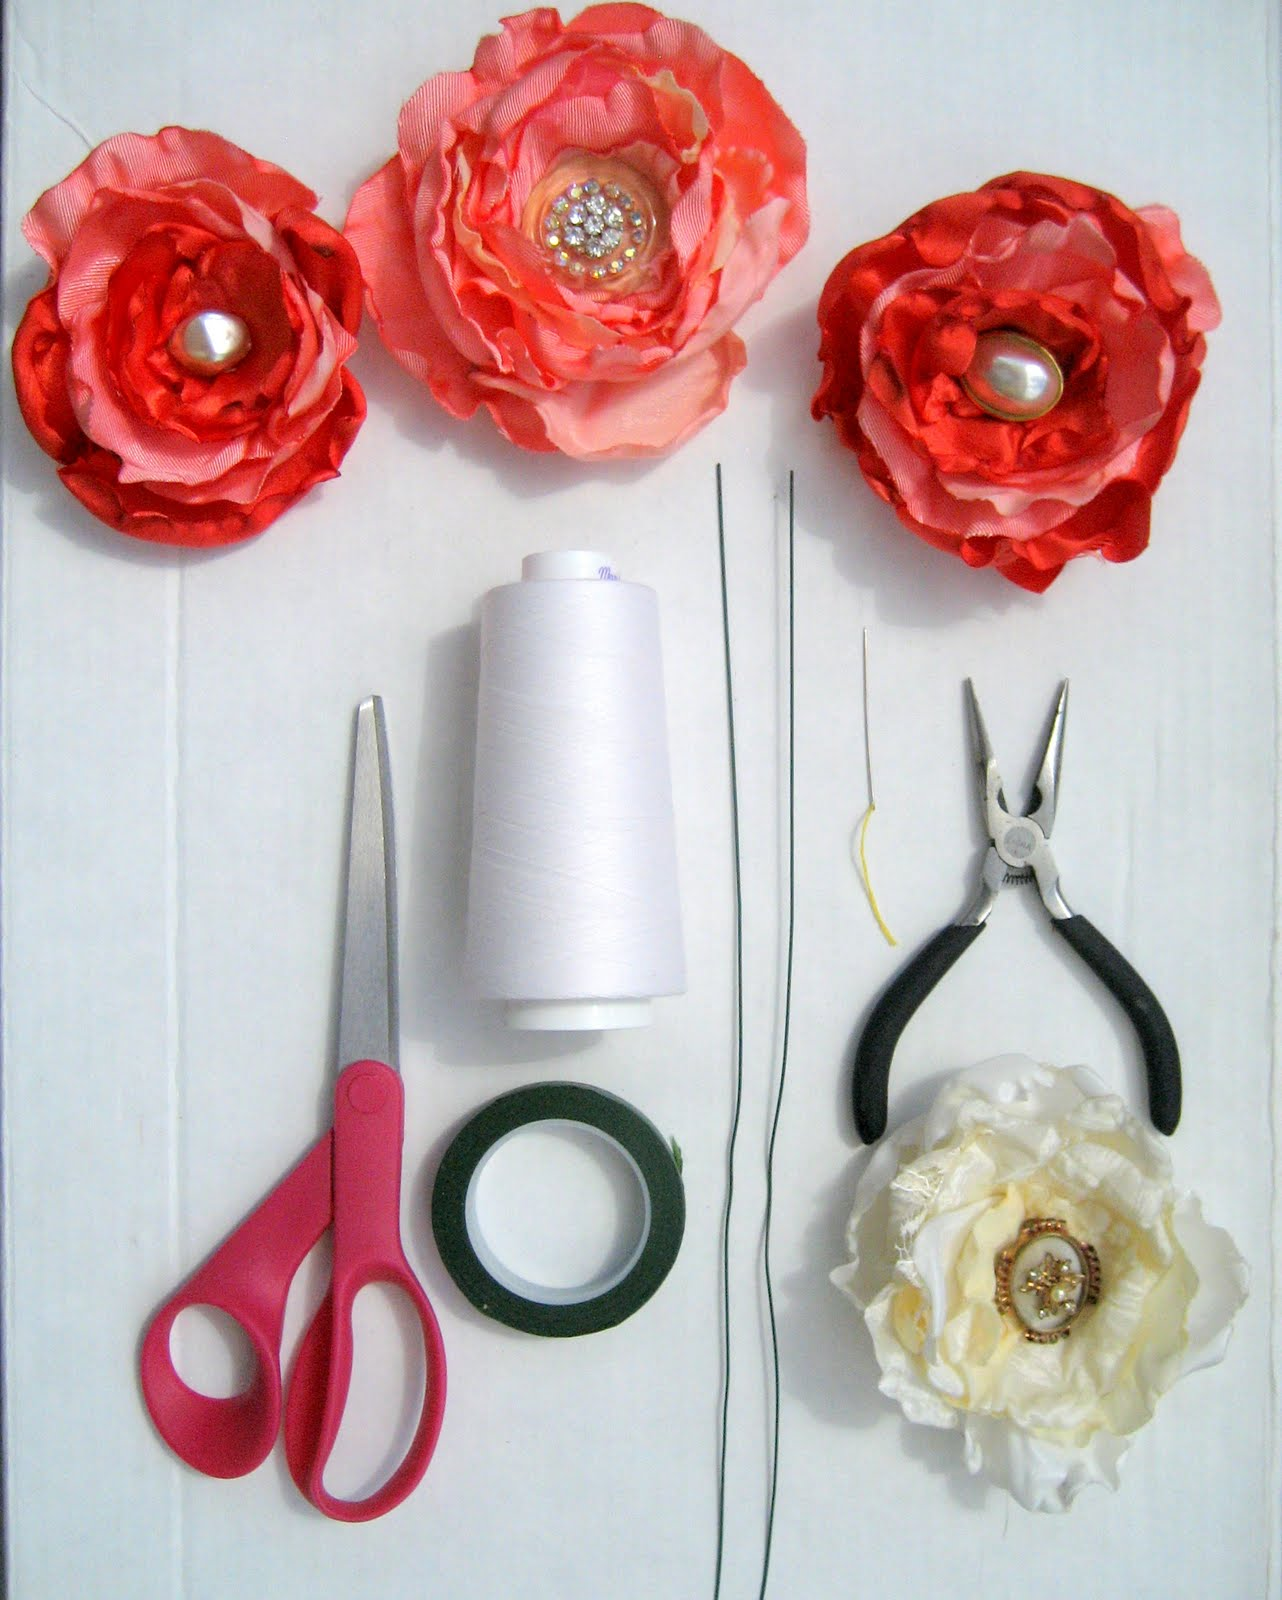 Diy Flower For Wedding: Running With Scissors: DIY: Fabric Flower Wedding Bouquet